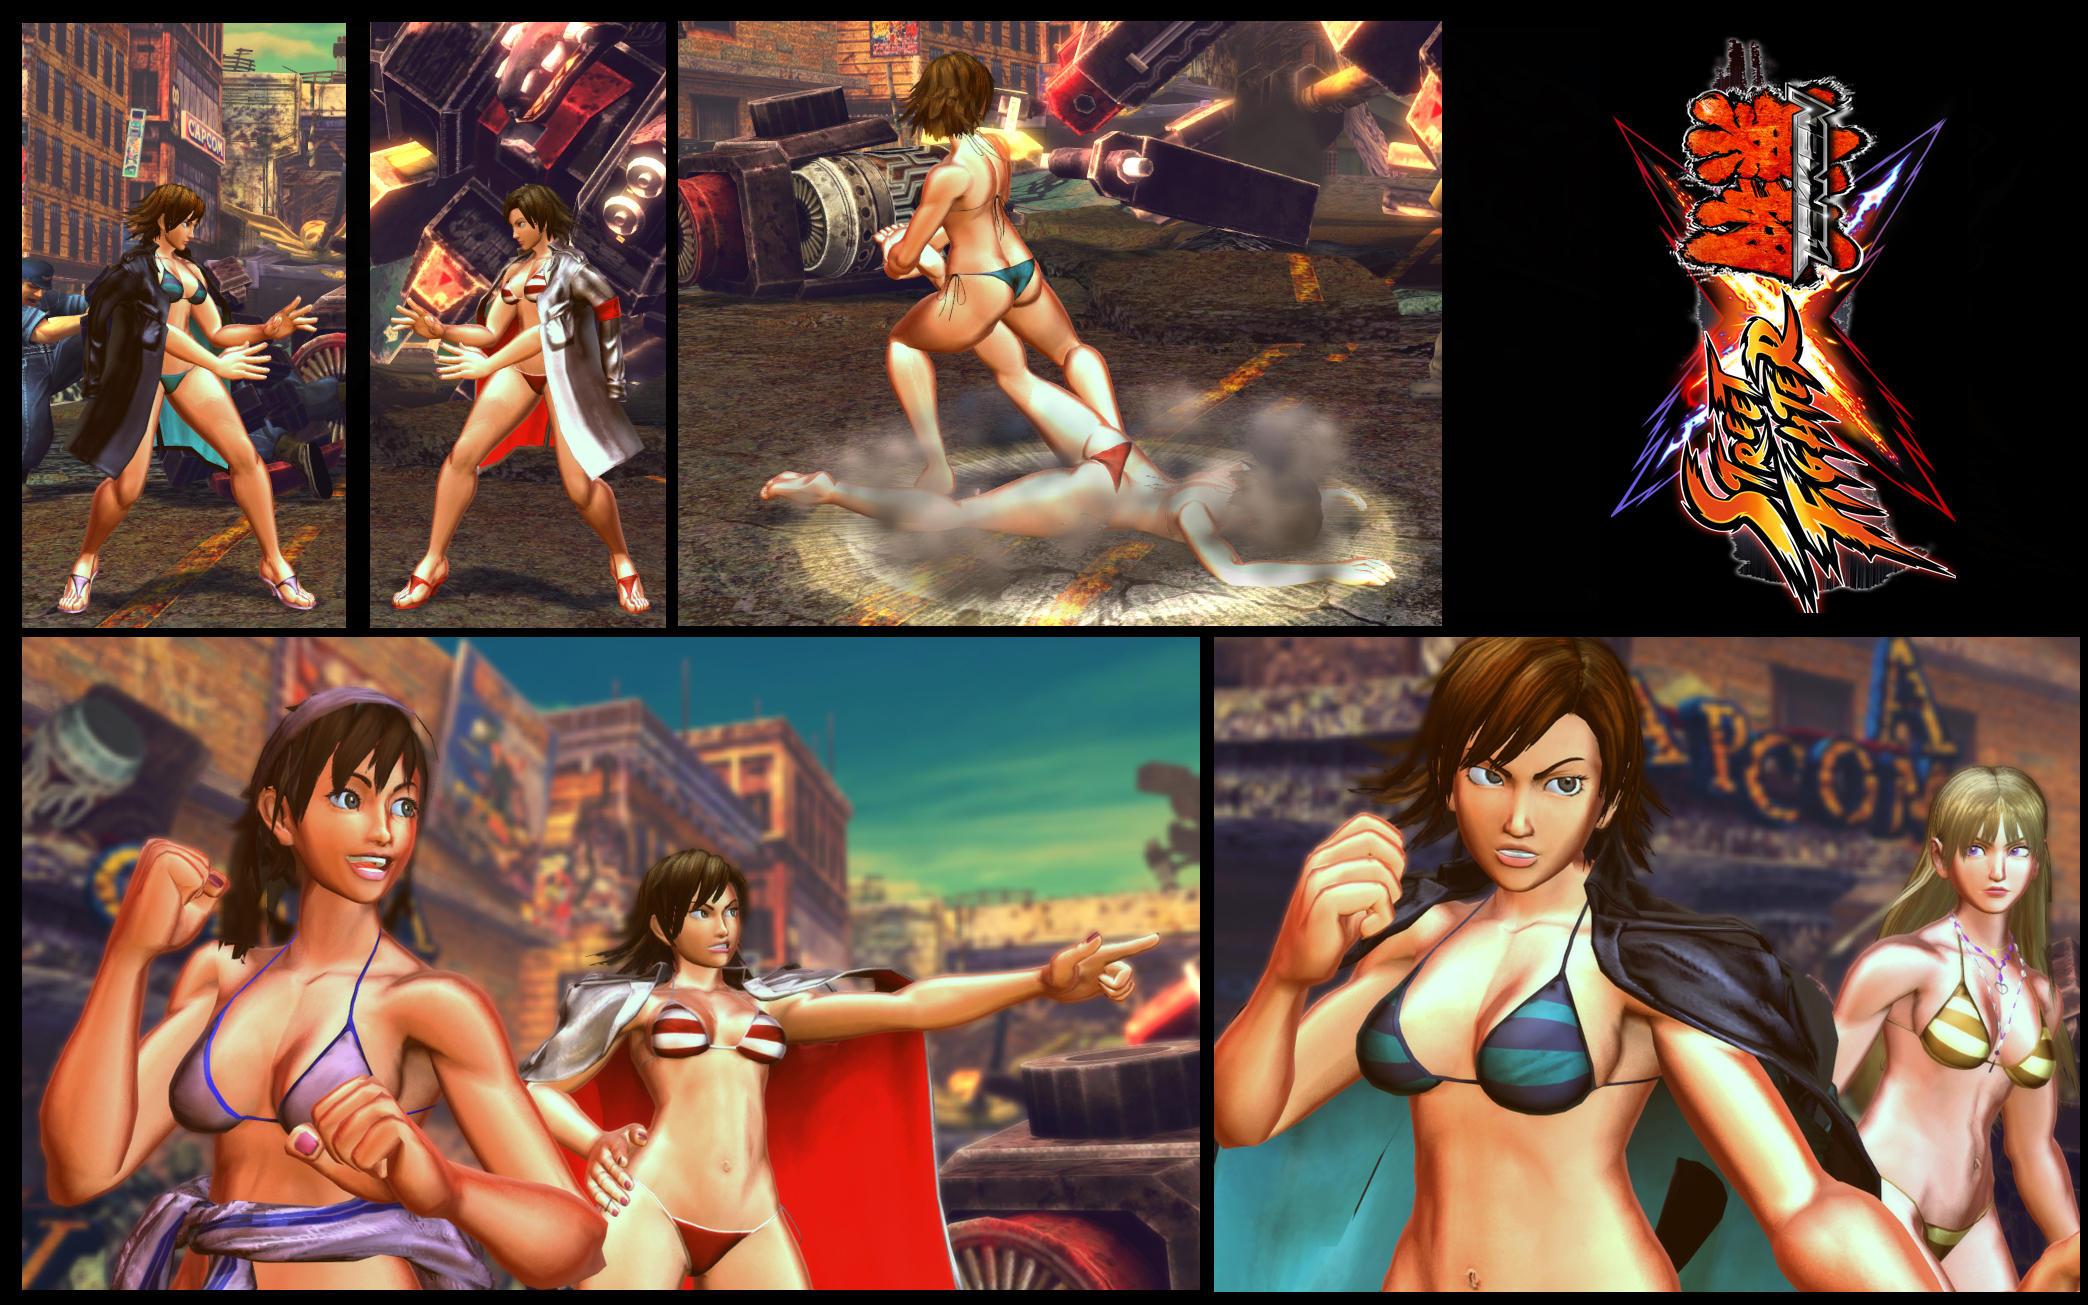 SF X TEKKEN bikini Asuka by monkeygigabuster